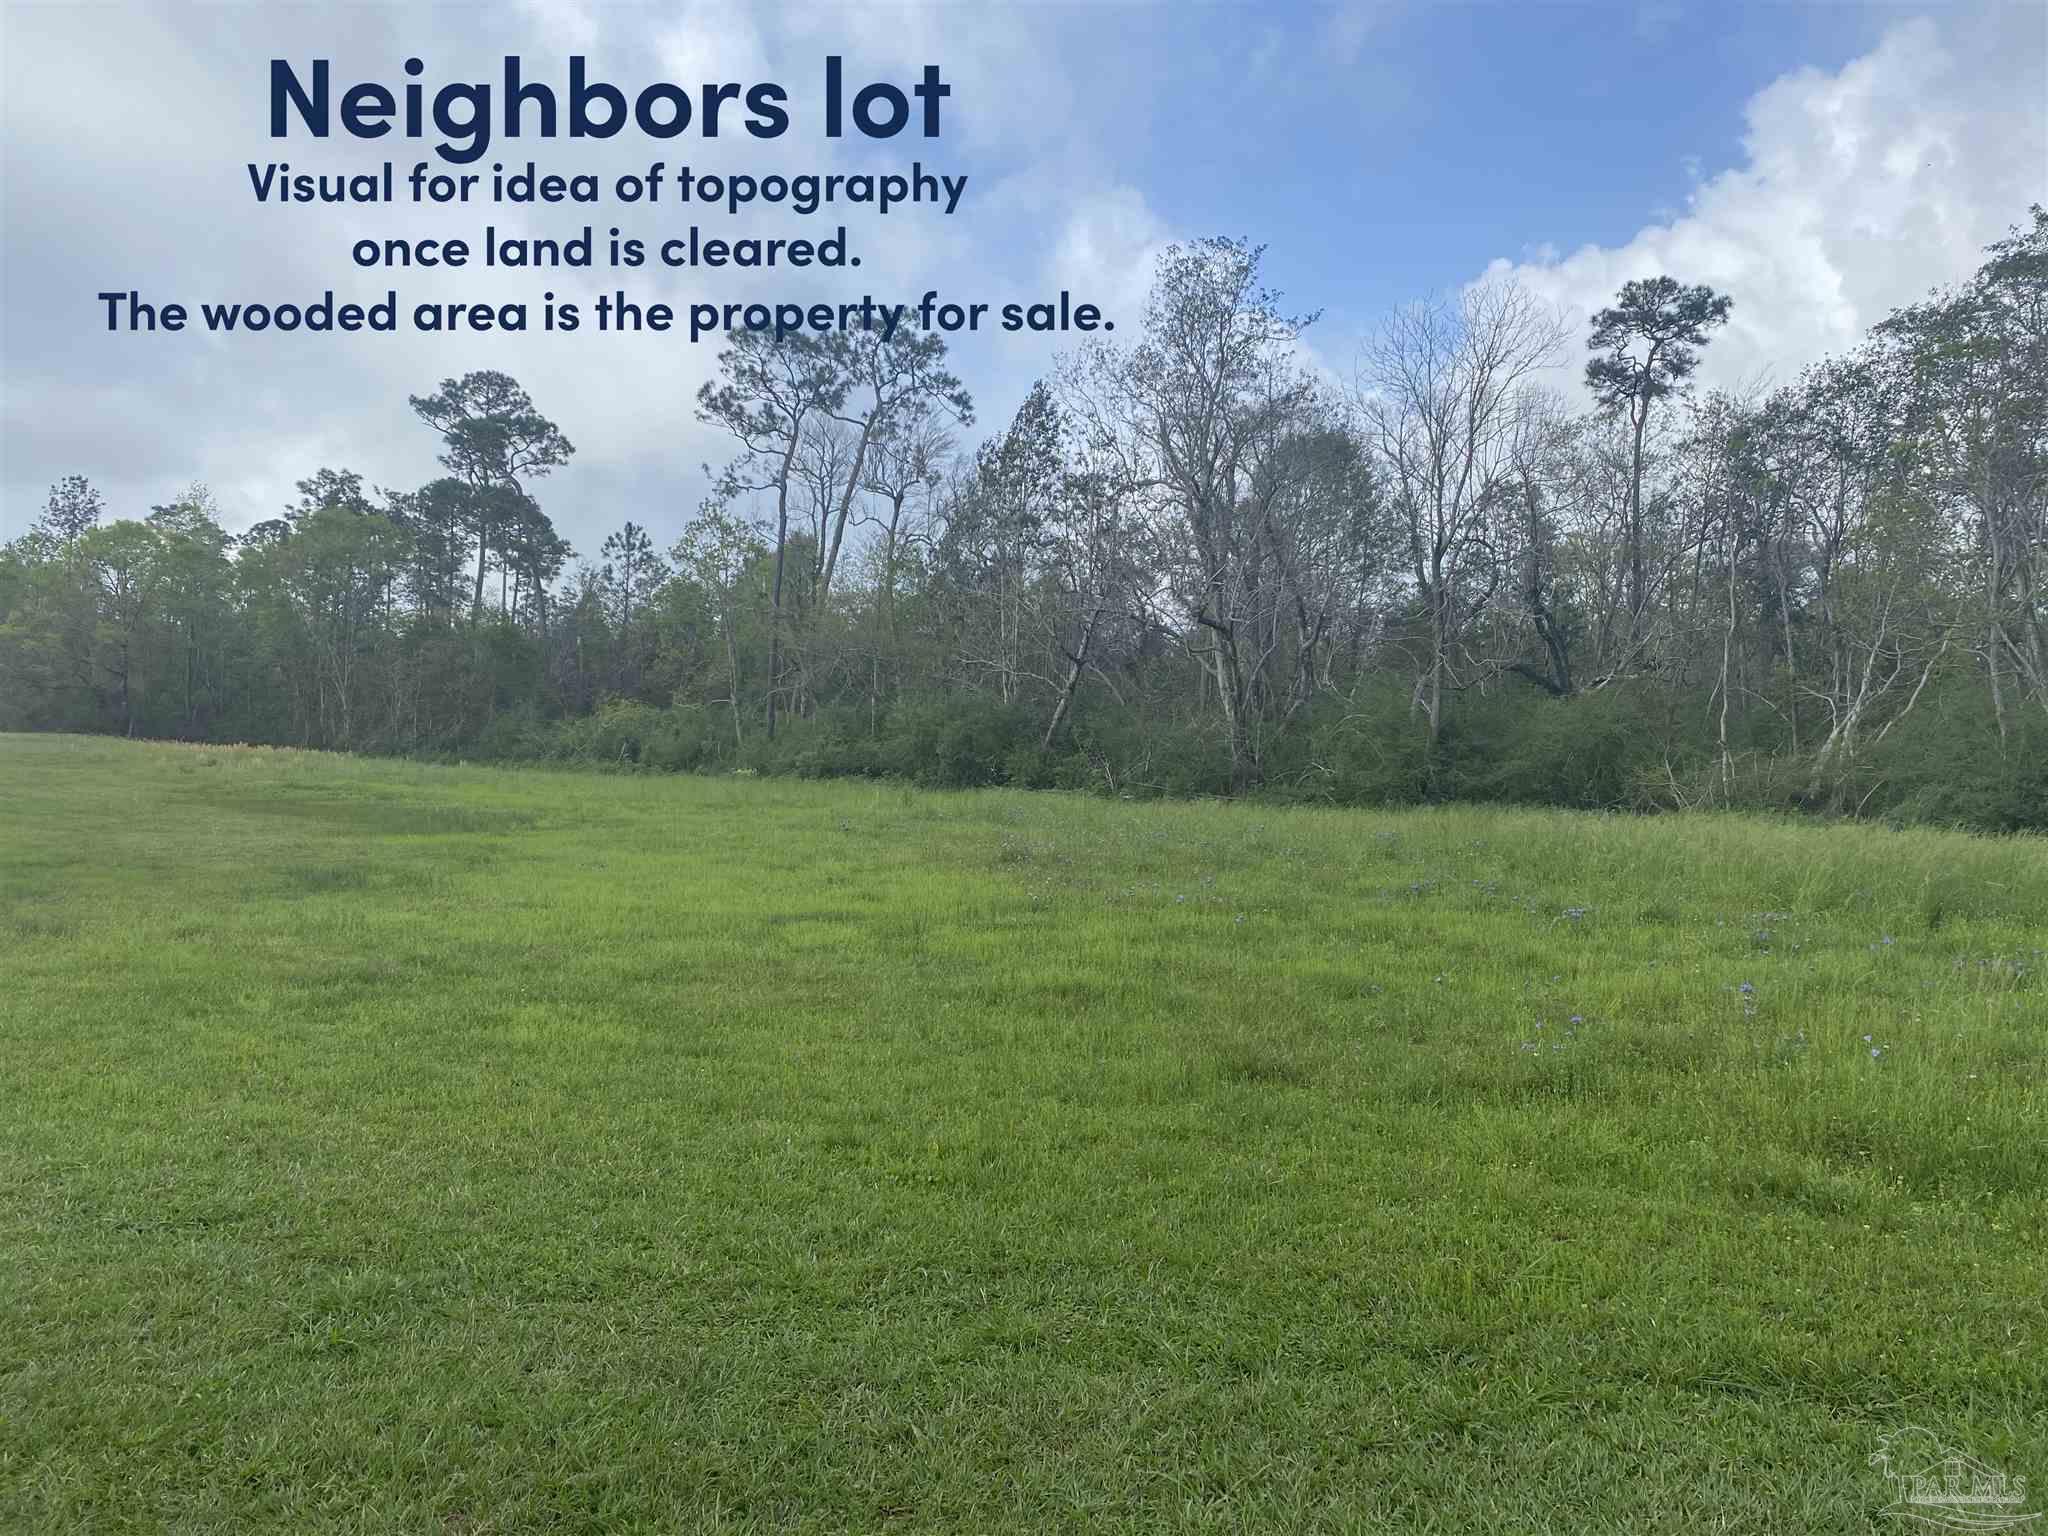 1555 W DETRIOT BLVD, Pensacola, Florida 32534, ,Lots And Land,For Sale,1555 W DETRIOT BLVD,587545